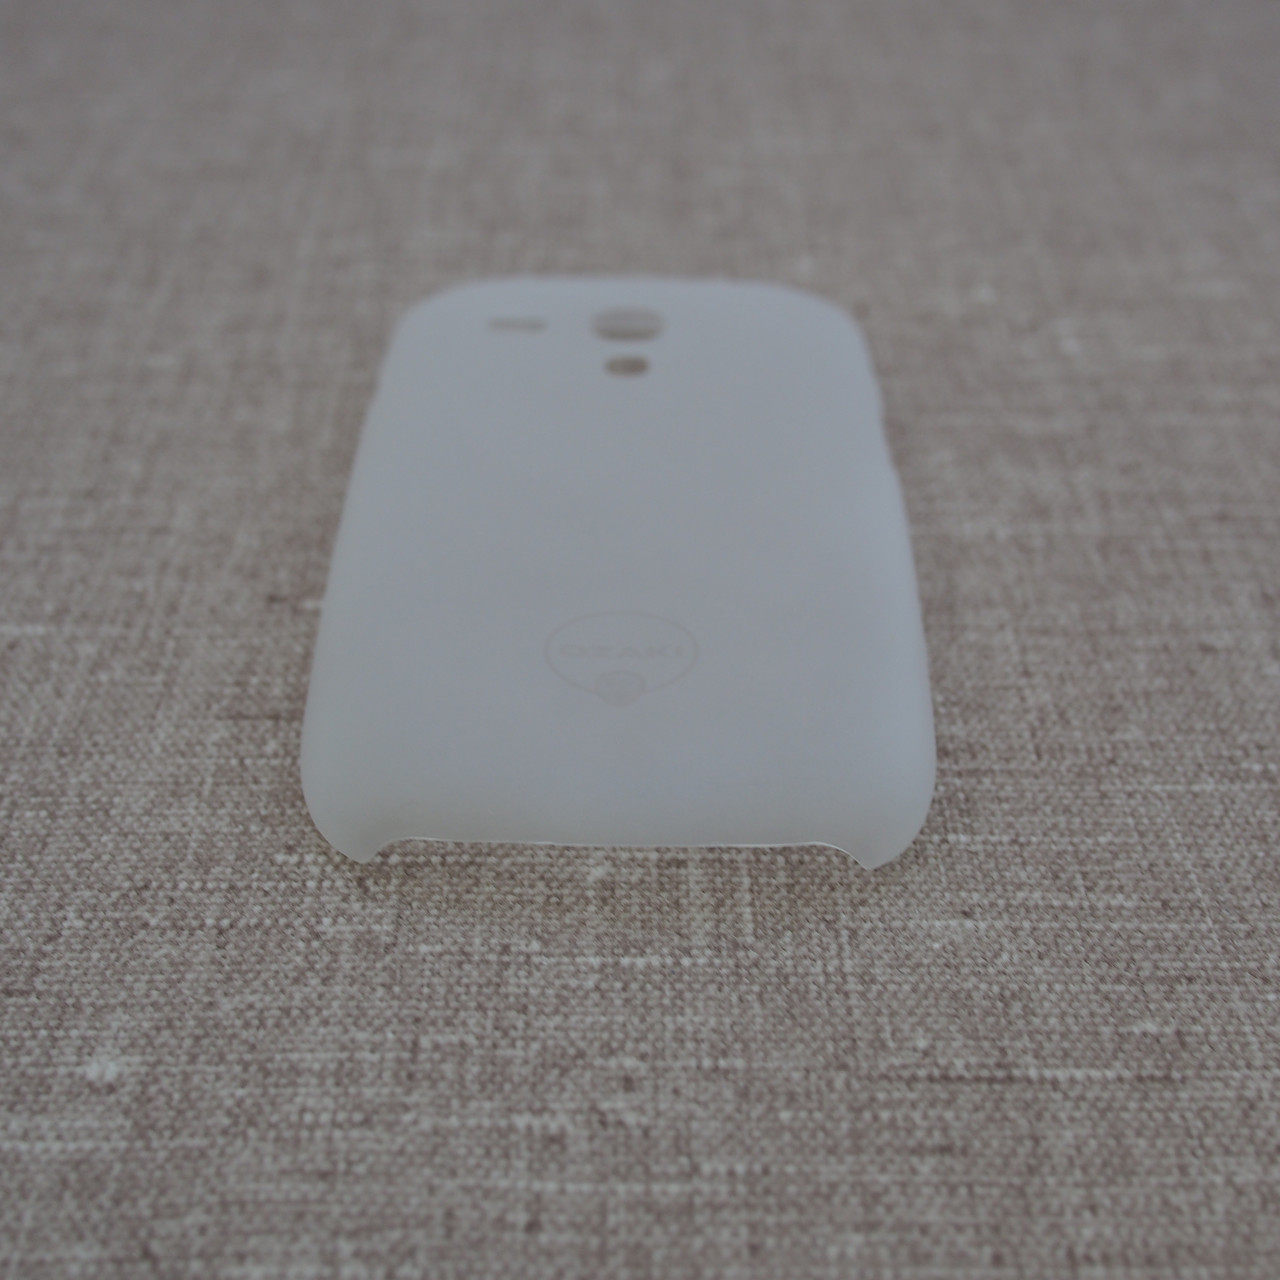 Чехол Ozaki O!Coat 0.4 Samsung Galaxy S3 mini Jelly white Для телефона i8190